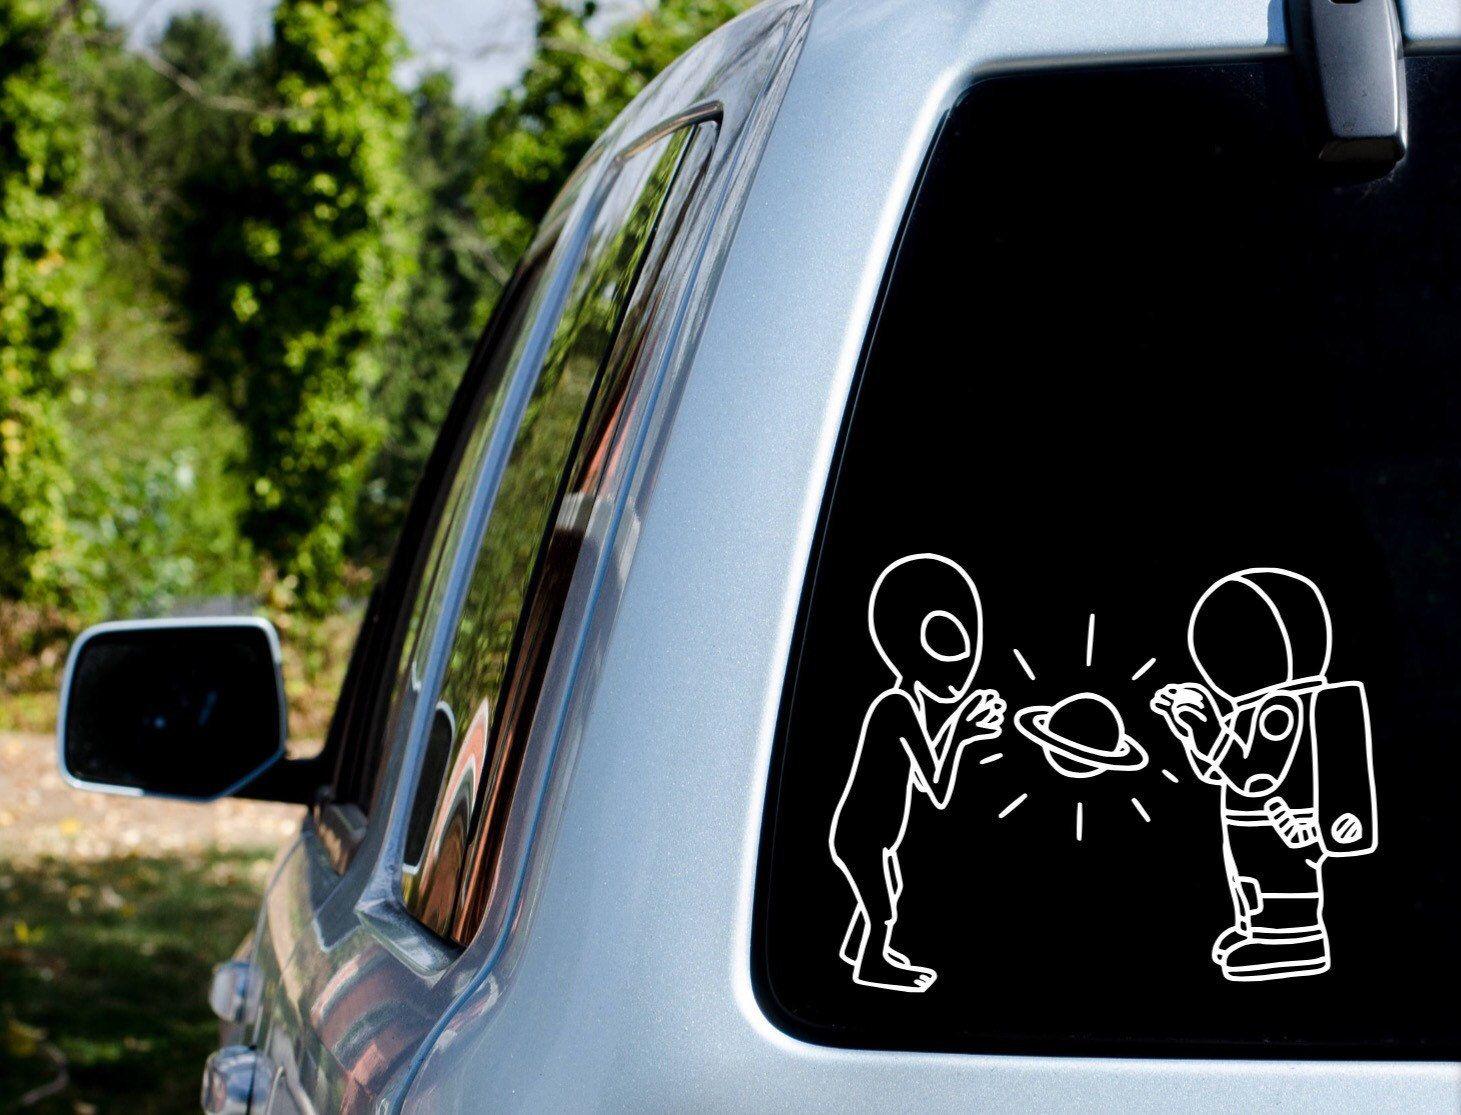 Astronaut Vs Alien Astronaut Alien Space Galaxy Car Decal Decal Car Sticker Sticker Holographic Galaxy Car Vinyl Decal Stickers Car Stickers [ 1115 x 1461 Pixel ]